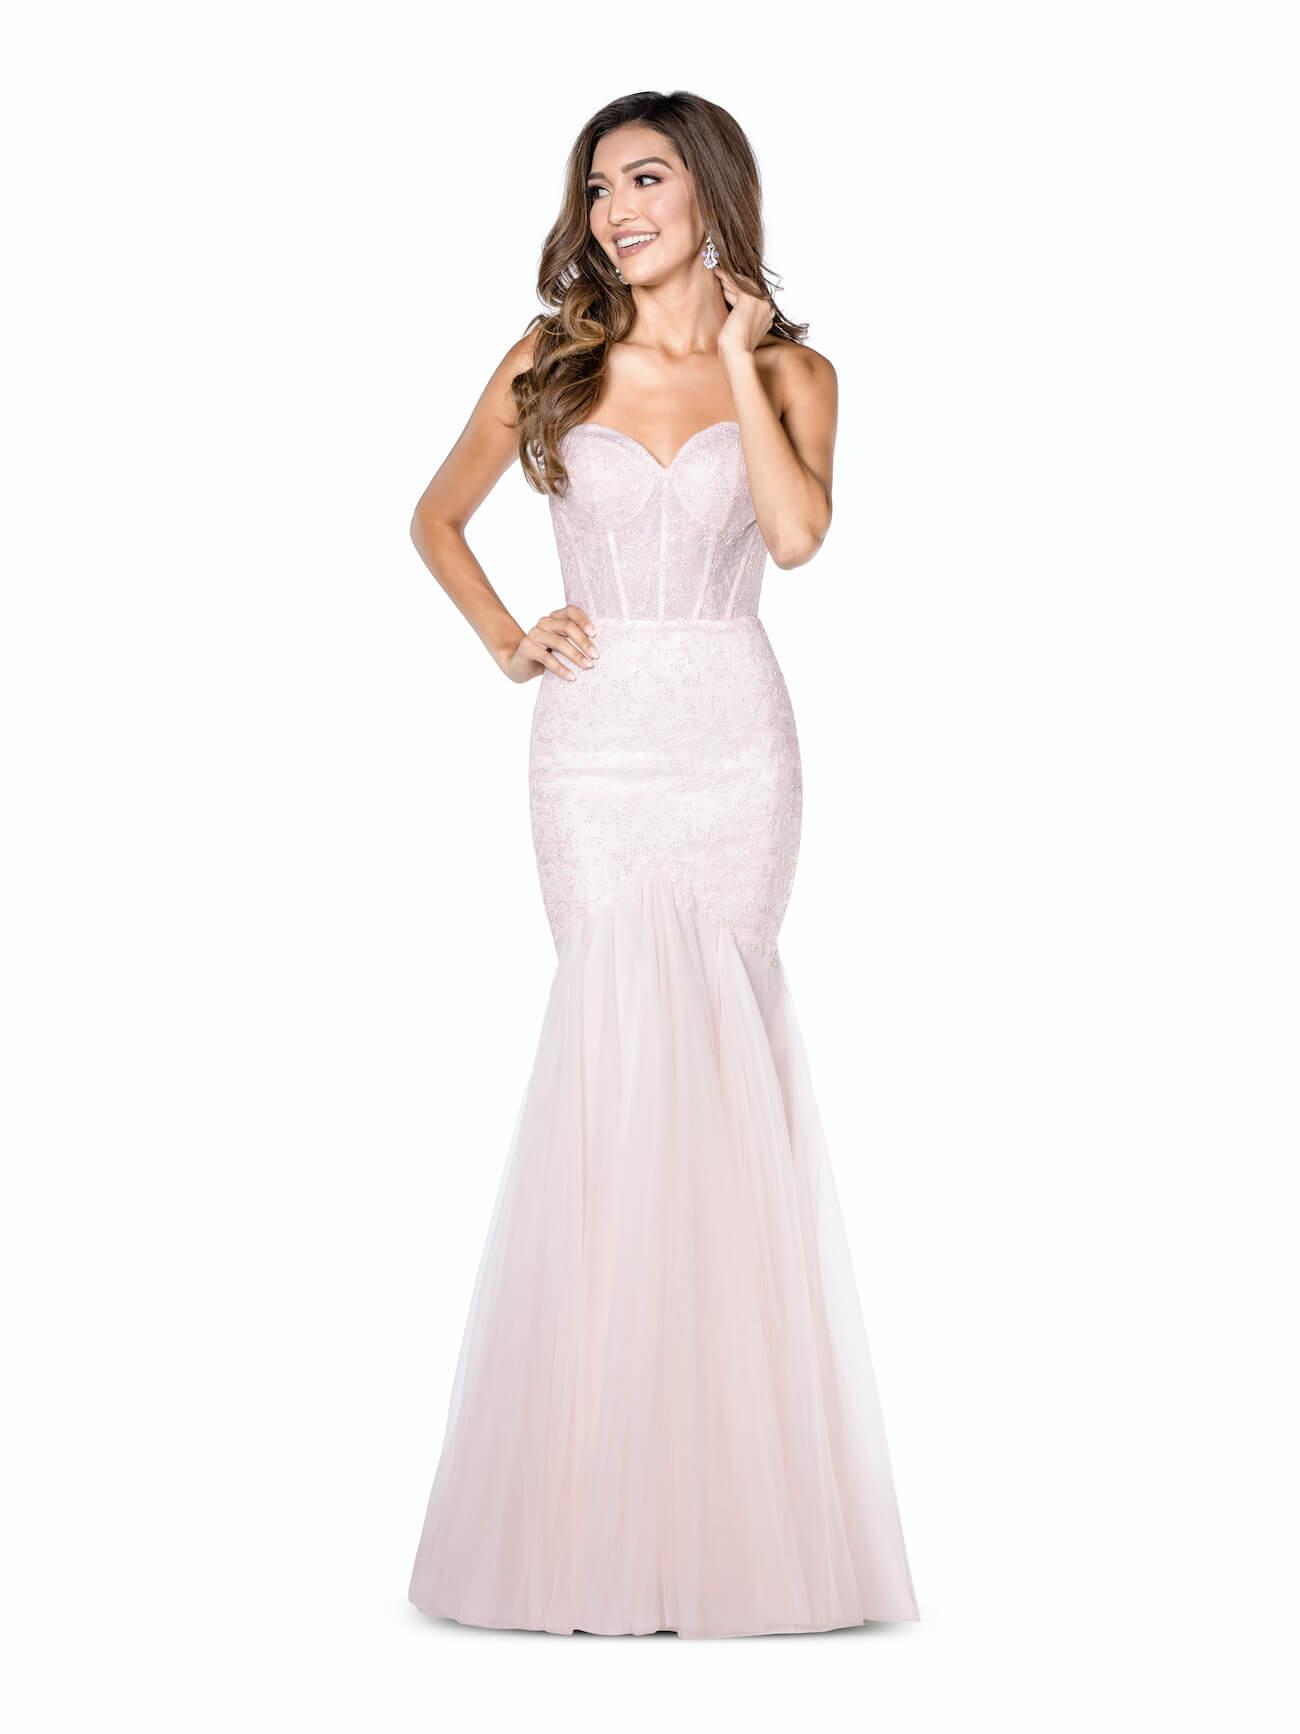 Vienna Light Pink Size 2 Strapless Mermaid Dress on Queenly